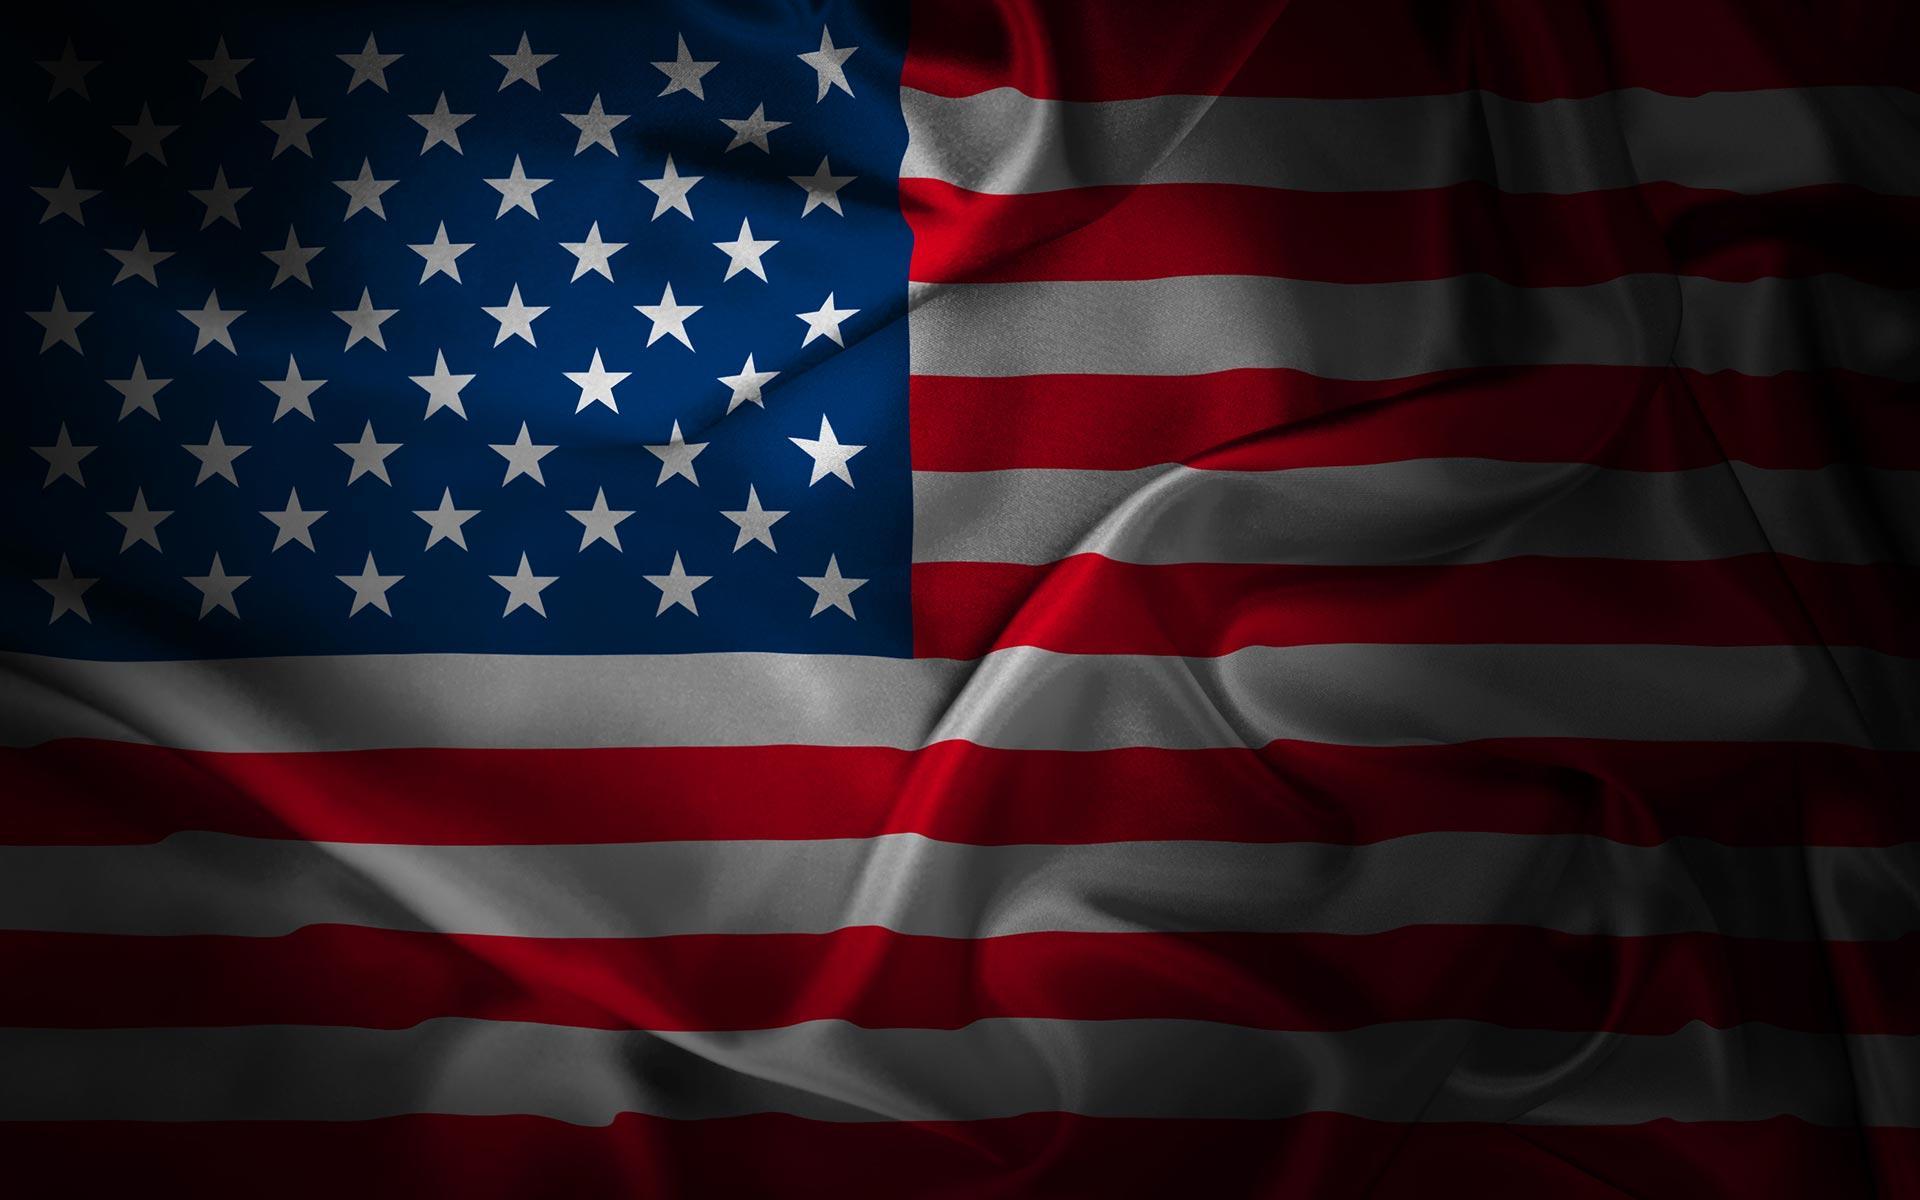 American Flag HD Wallpapers - Top Free American Flag HD ...